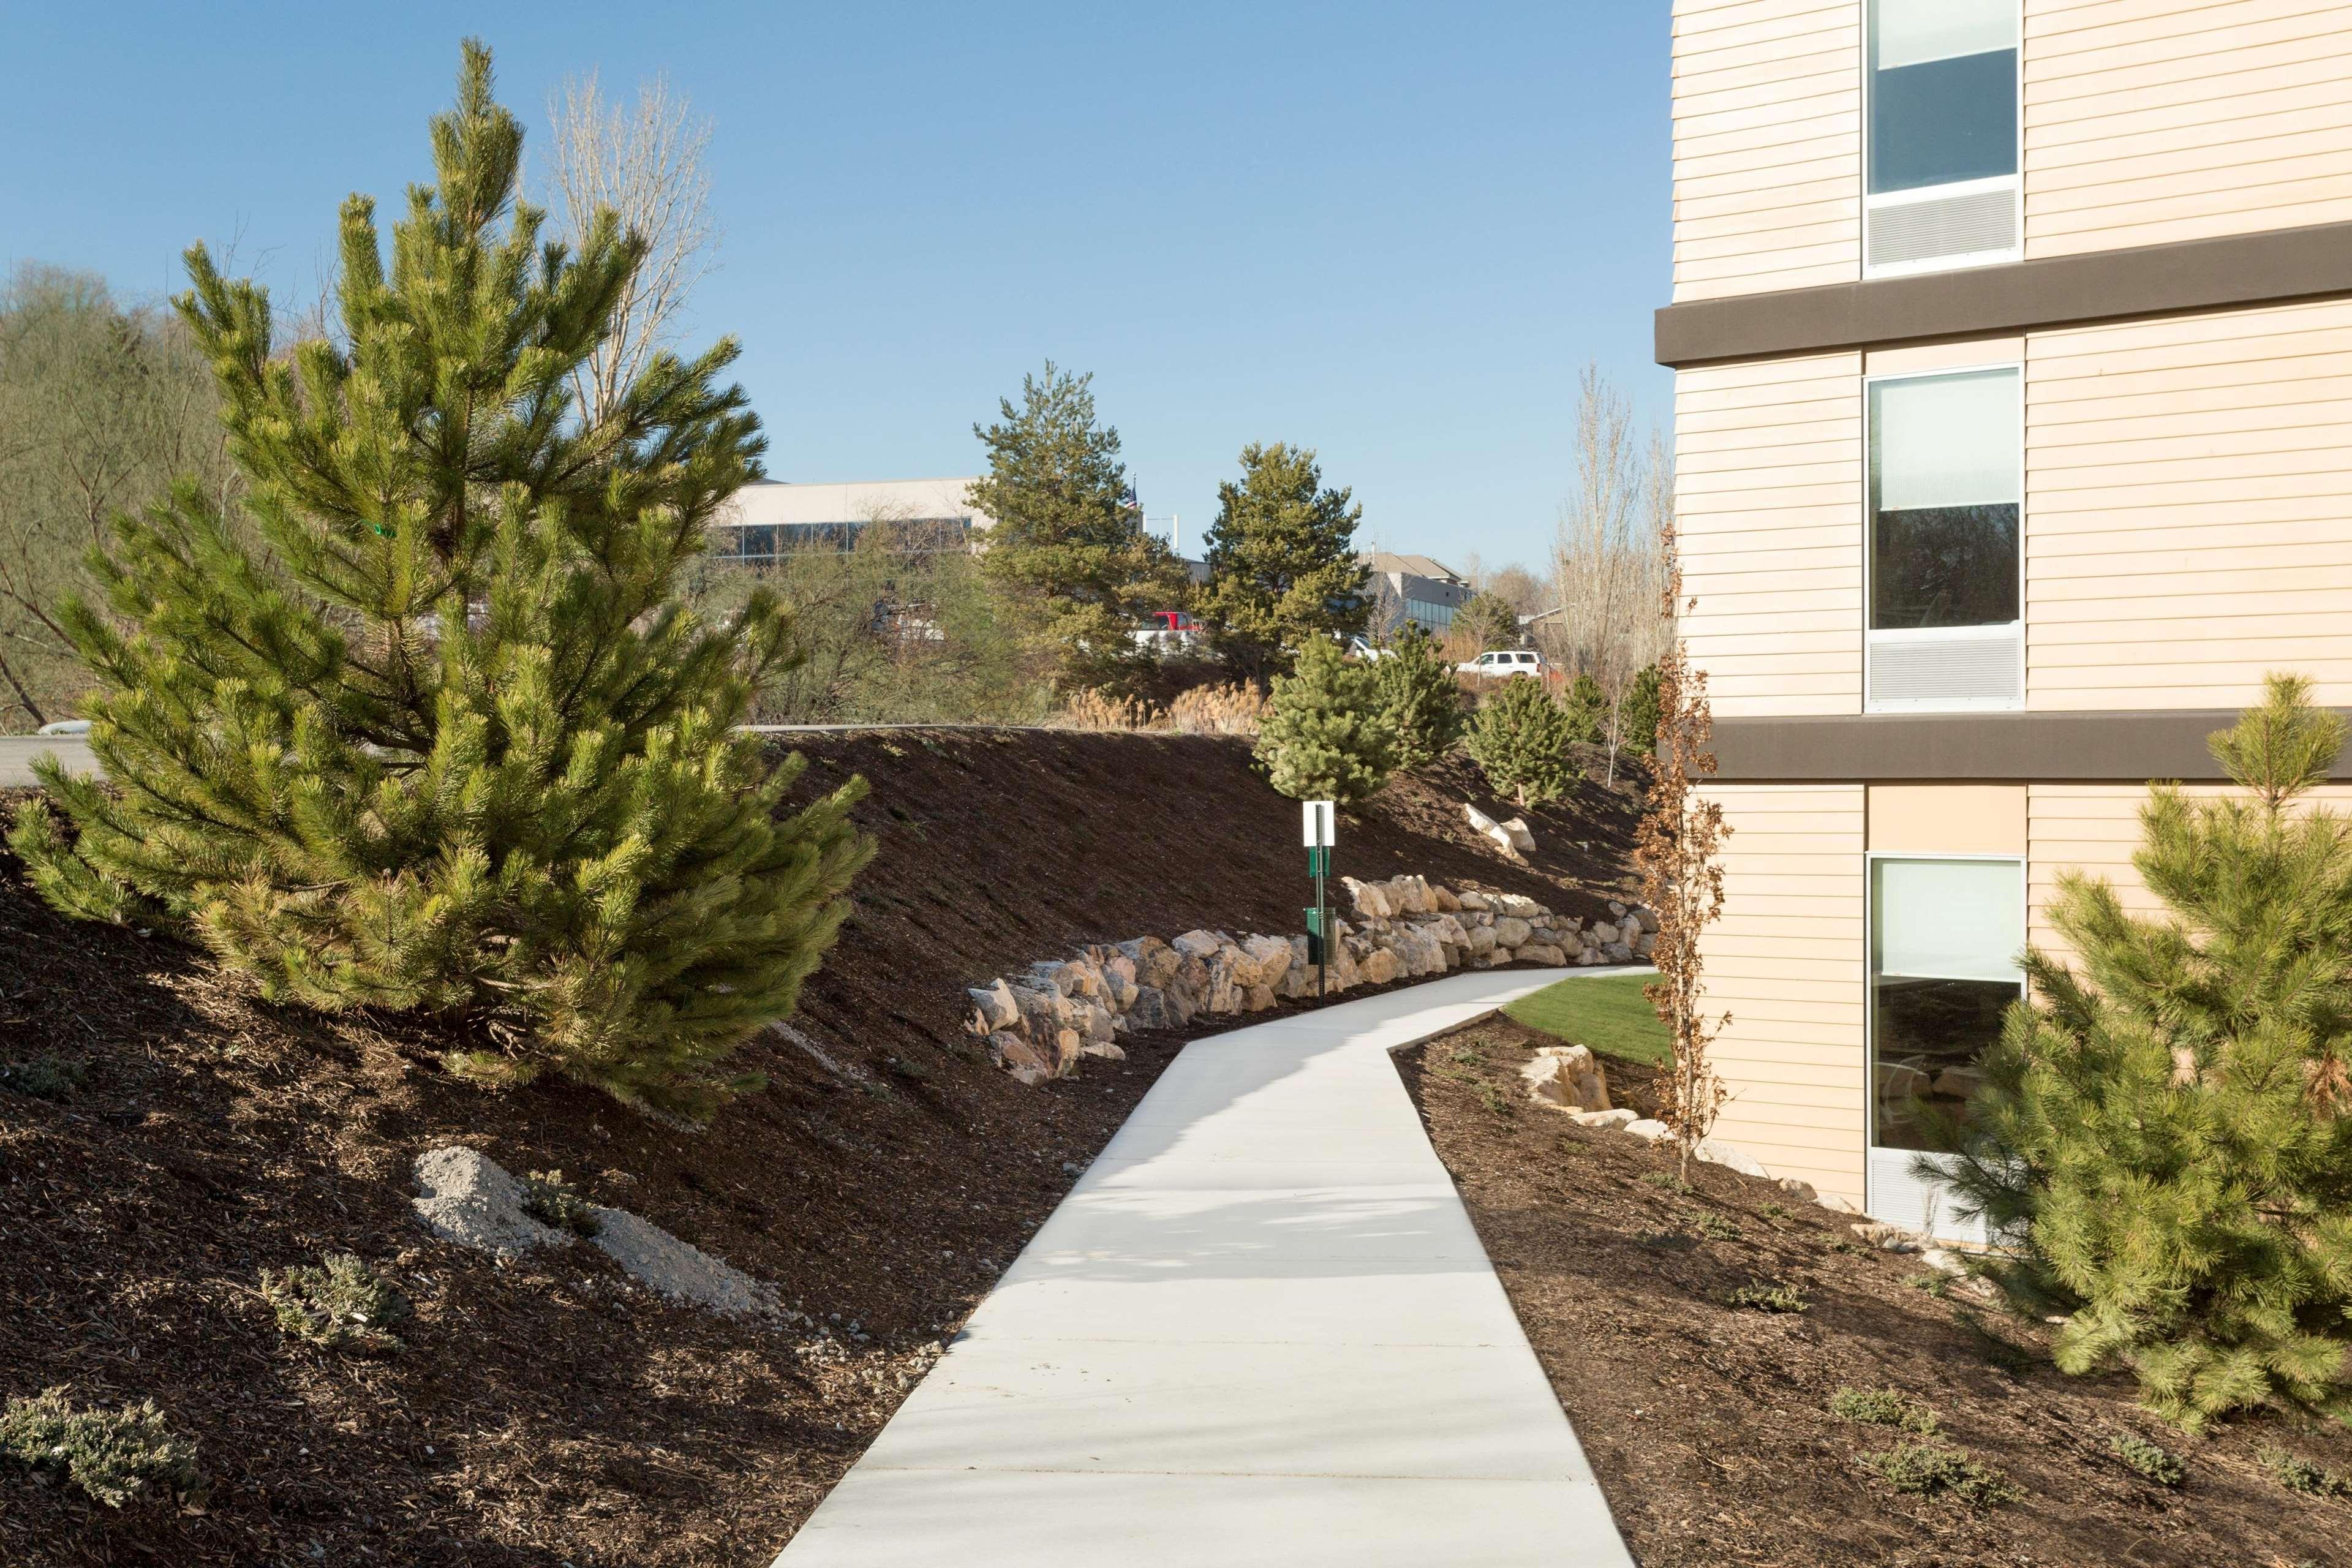 Home2 Suites By Hilton Salt Lake City South Jordan Ut 10704 River Front Parkway Hotels Motels Mapquest